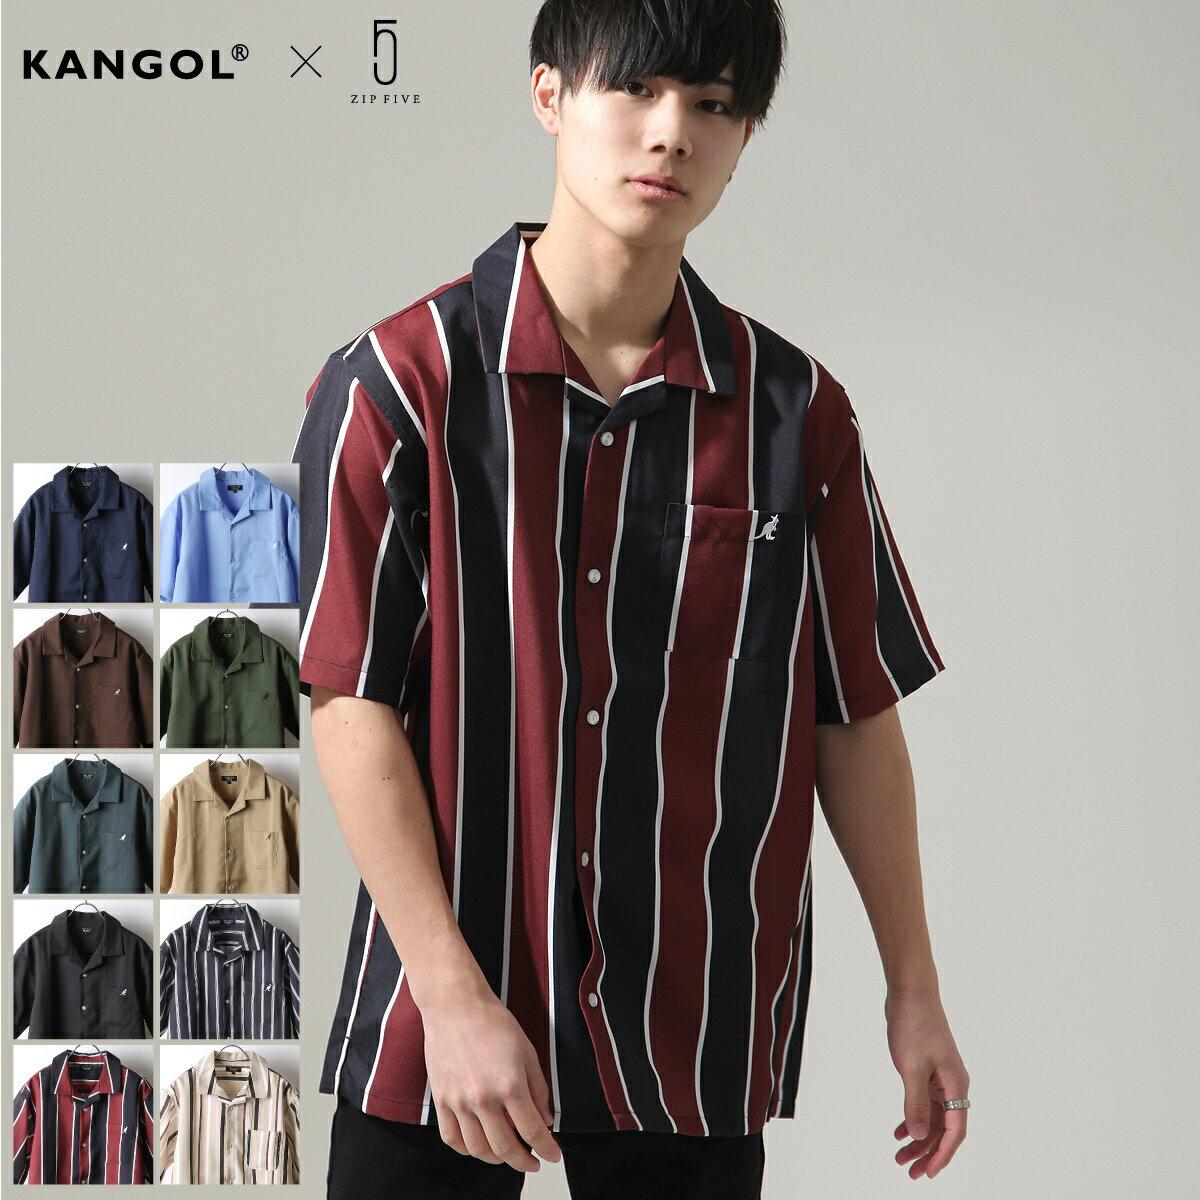 【ZIP】KANGOL短袖開領襯衫 特注款 0